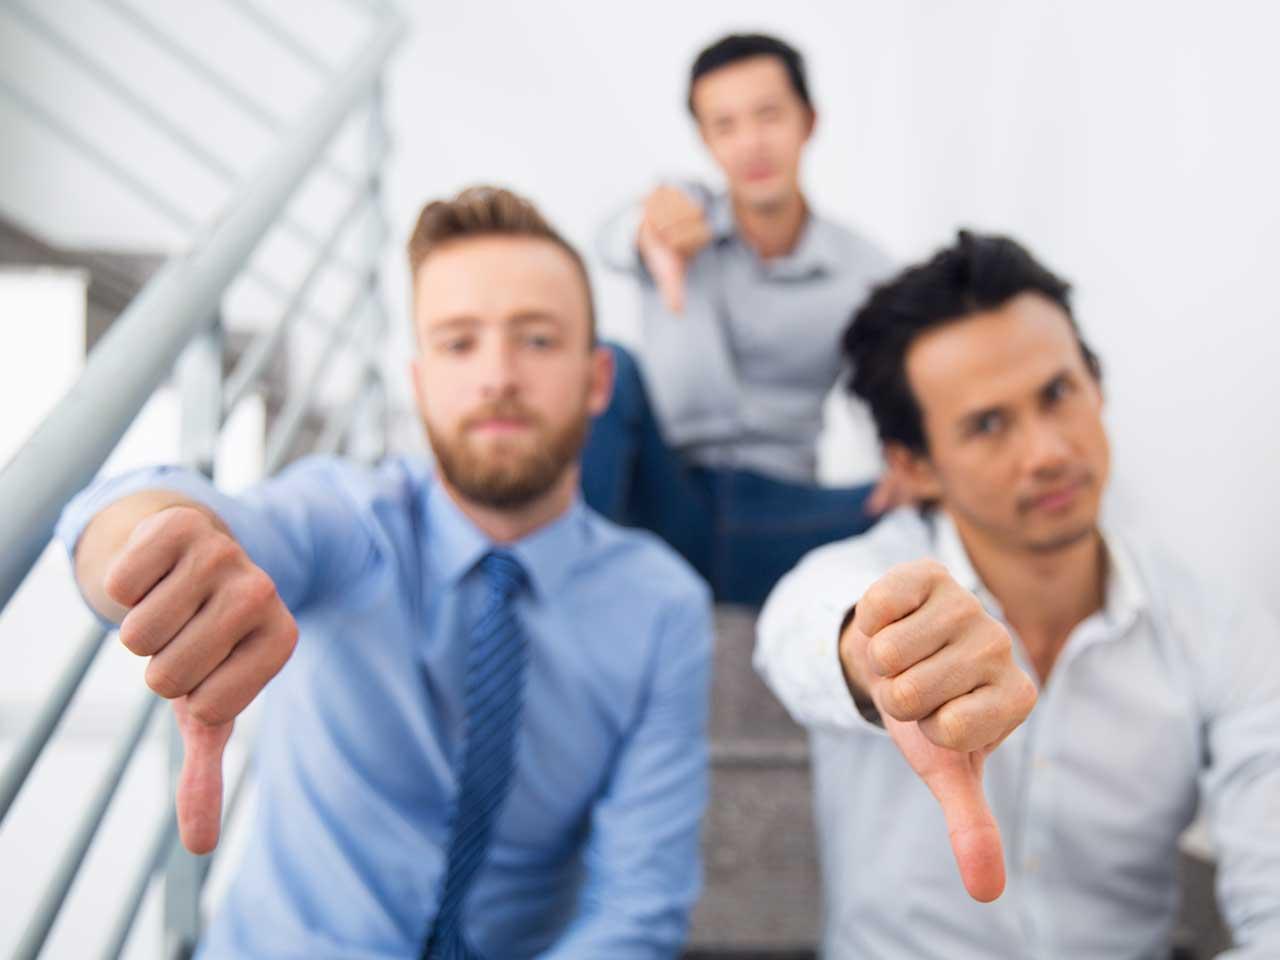 three men doing a thumbs down